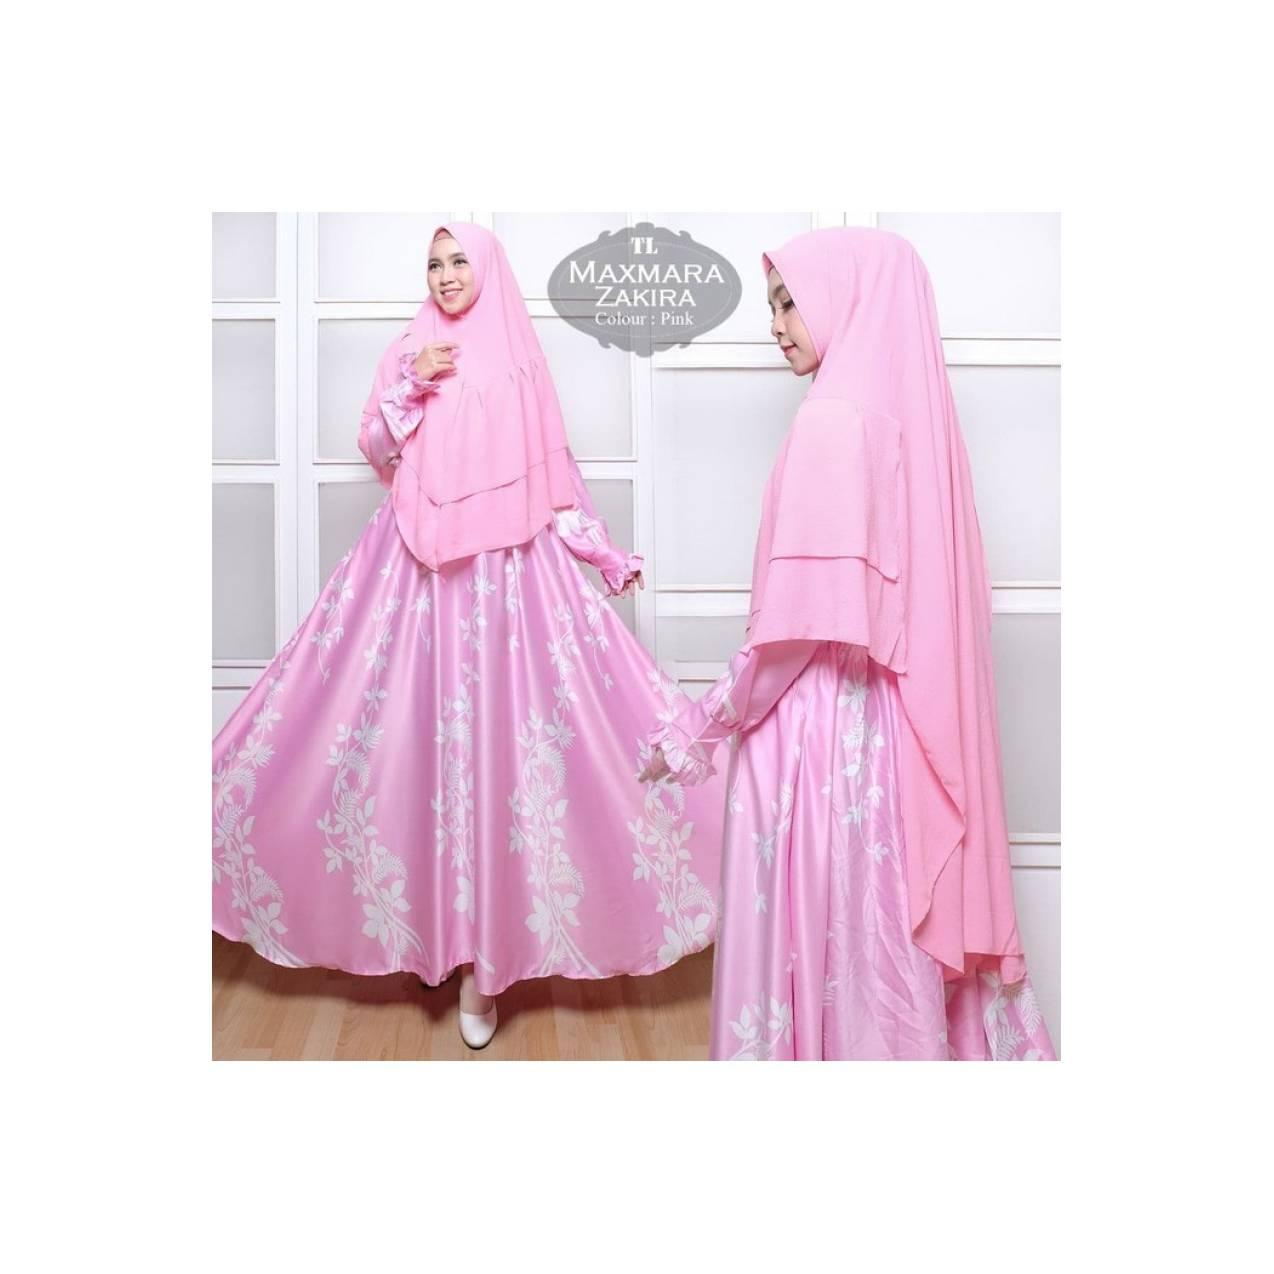 pink cokelat krem hitam gamis baju muslim pesta xxxl xxl jumbo bigsize